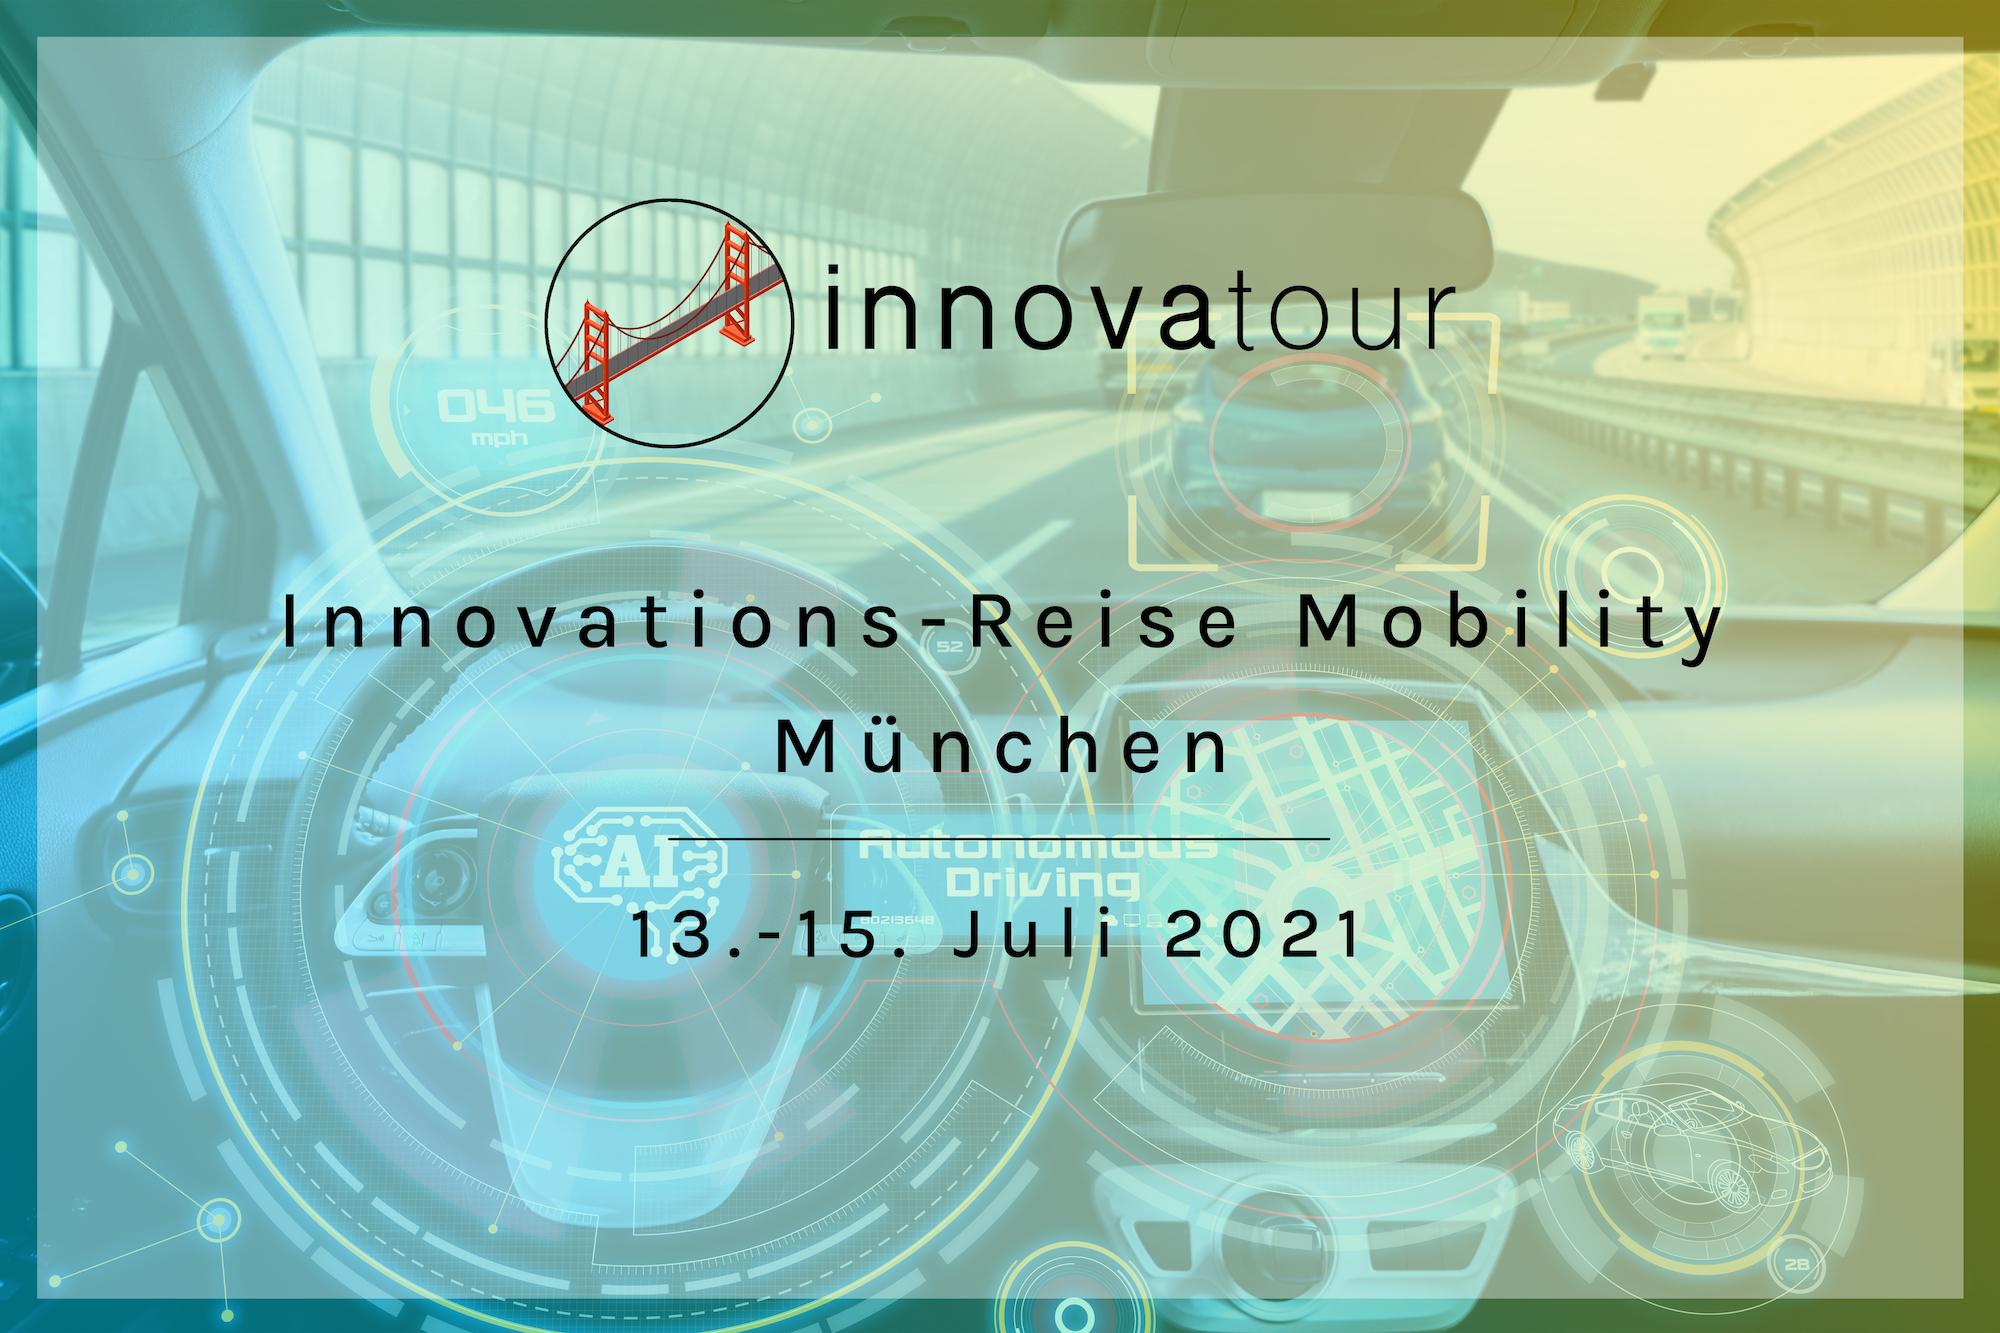 2021-11-05_Innovations-Reise_Mobility_München_v3